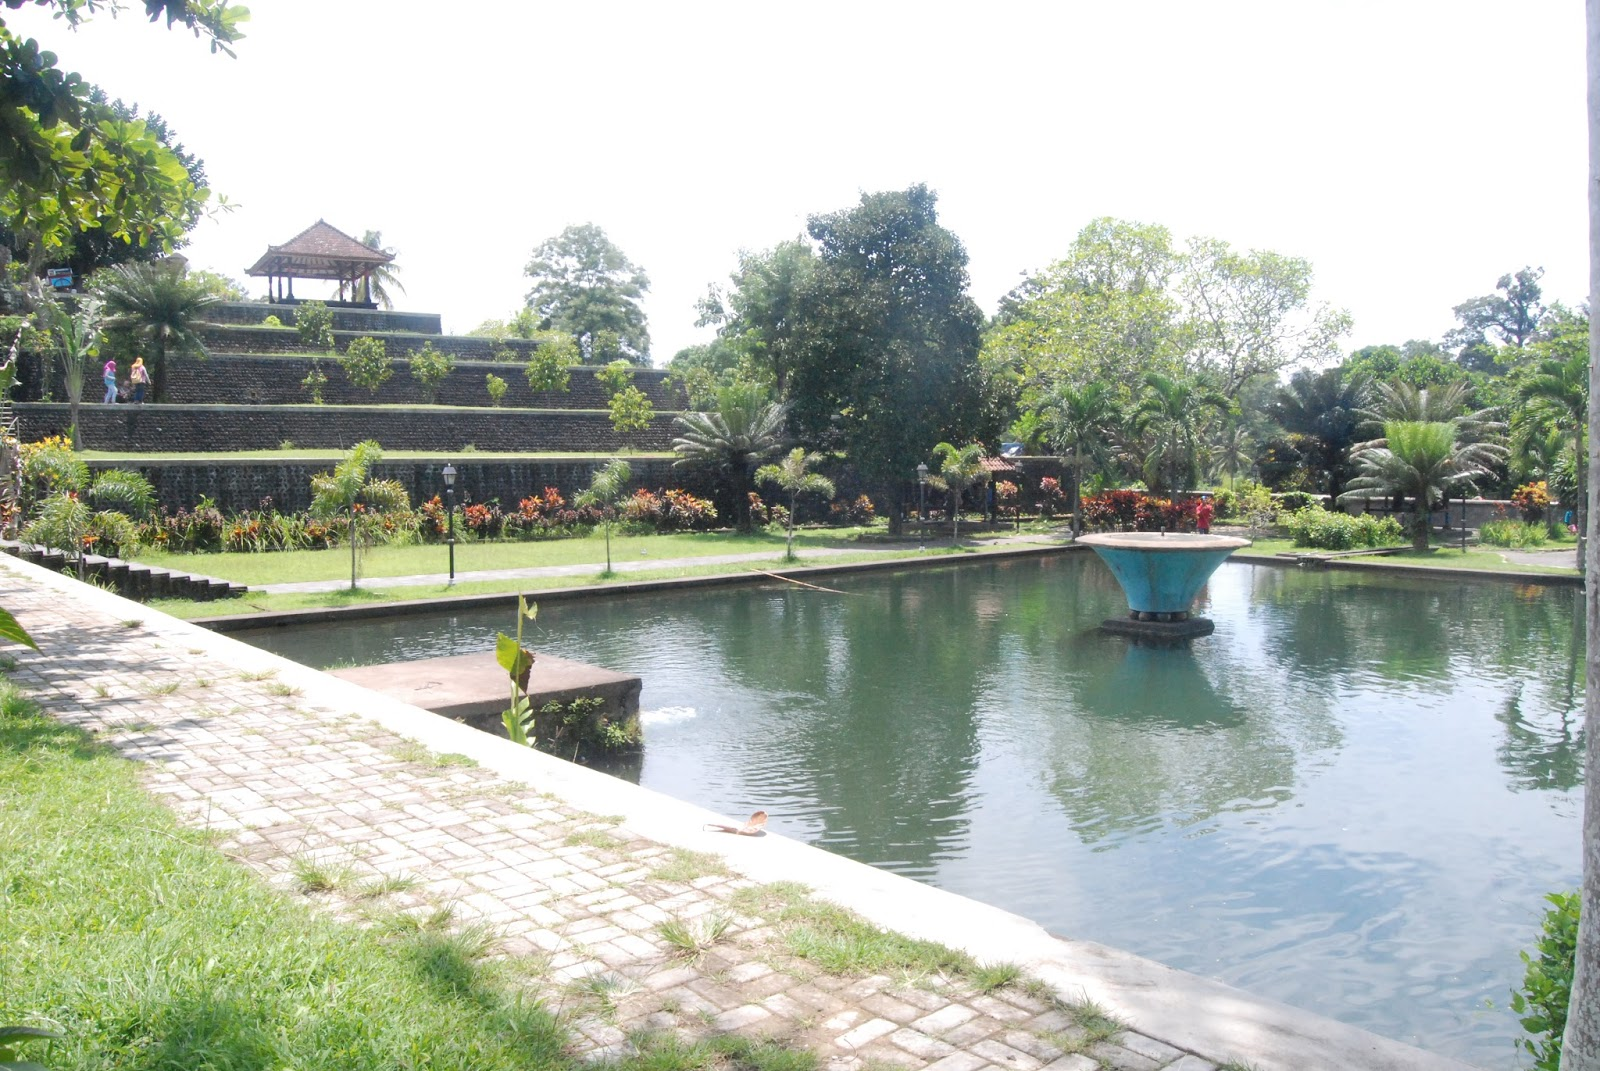 Passion Taman Narmada Pura Mayura Makam Loang Baloq Menurut Catatan